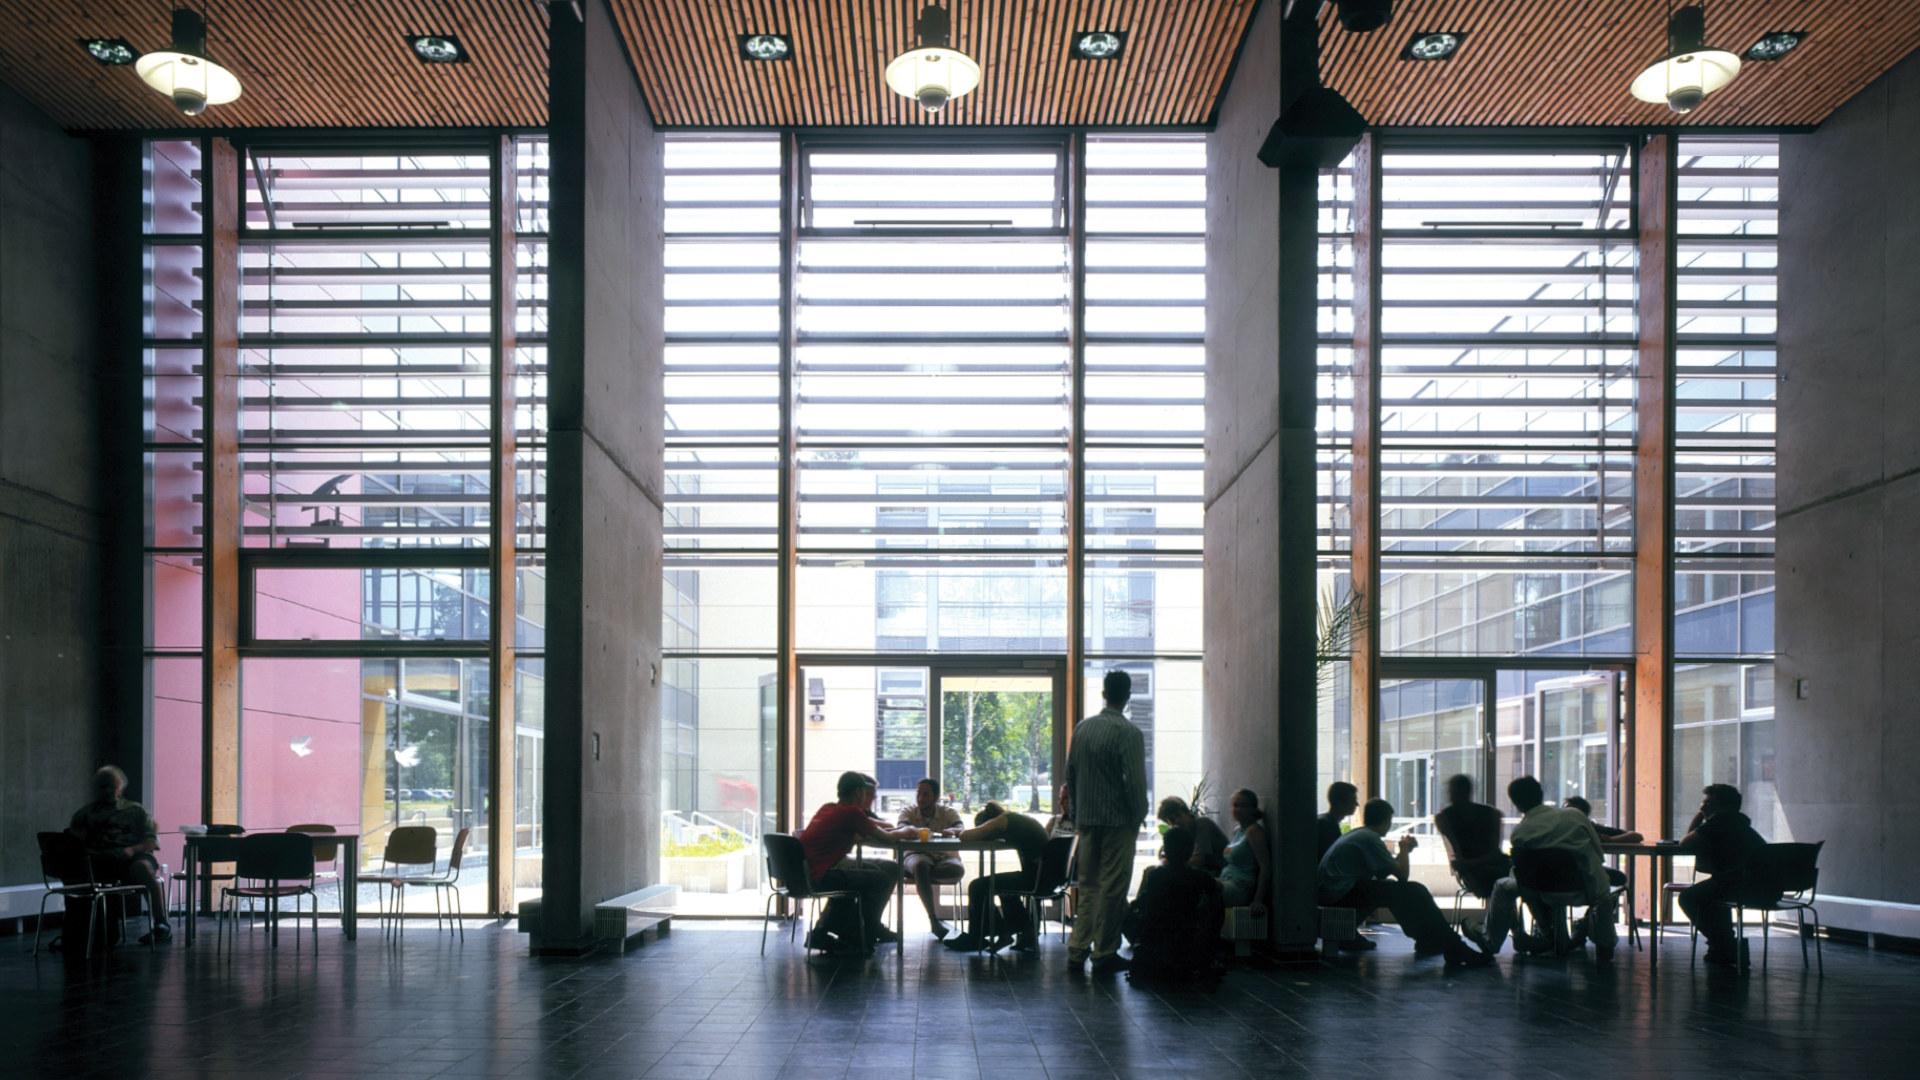 09-barnim-gymnasium-innen-w